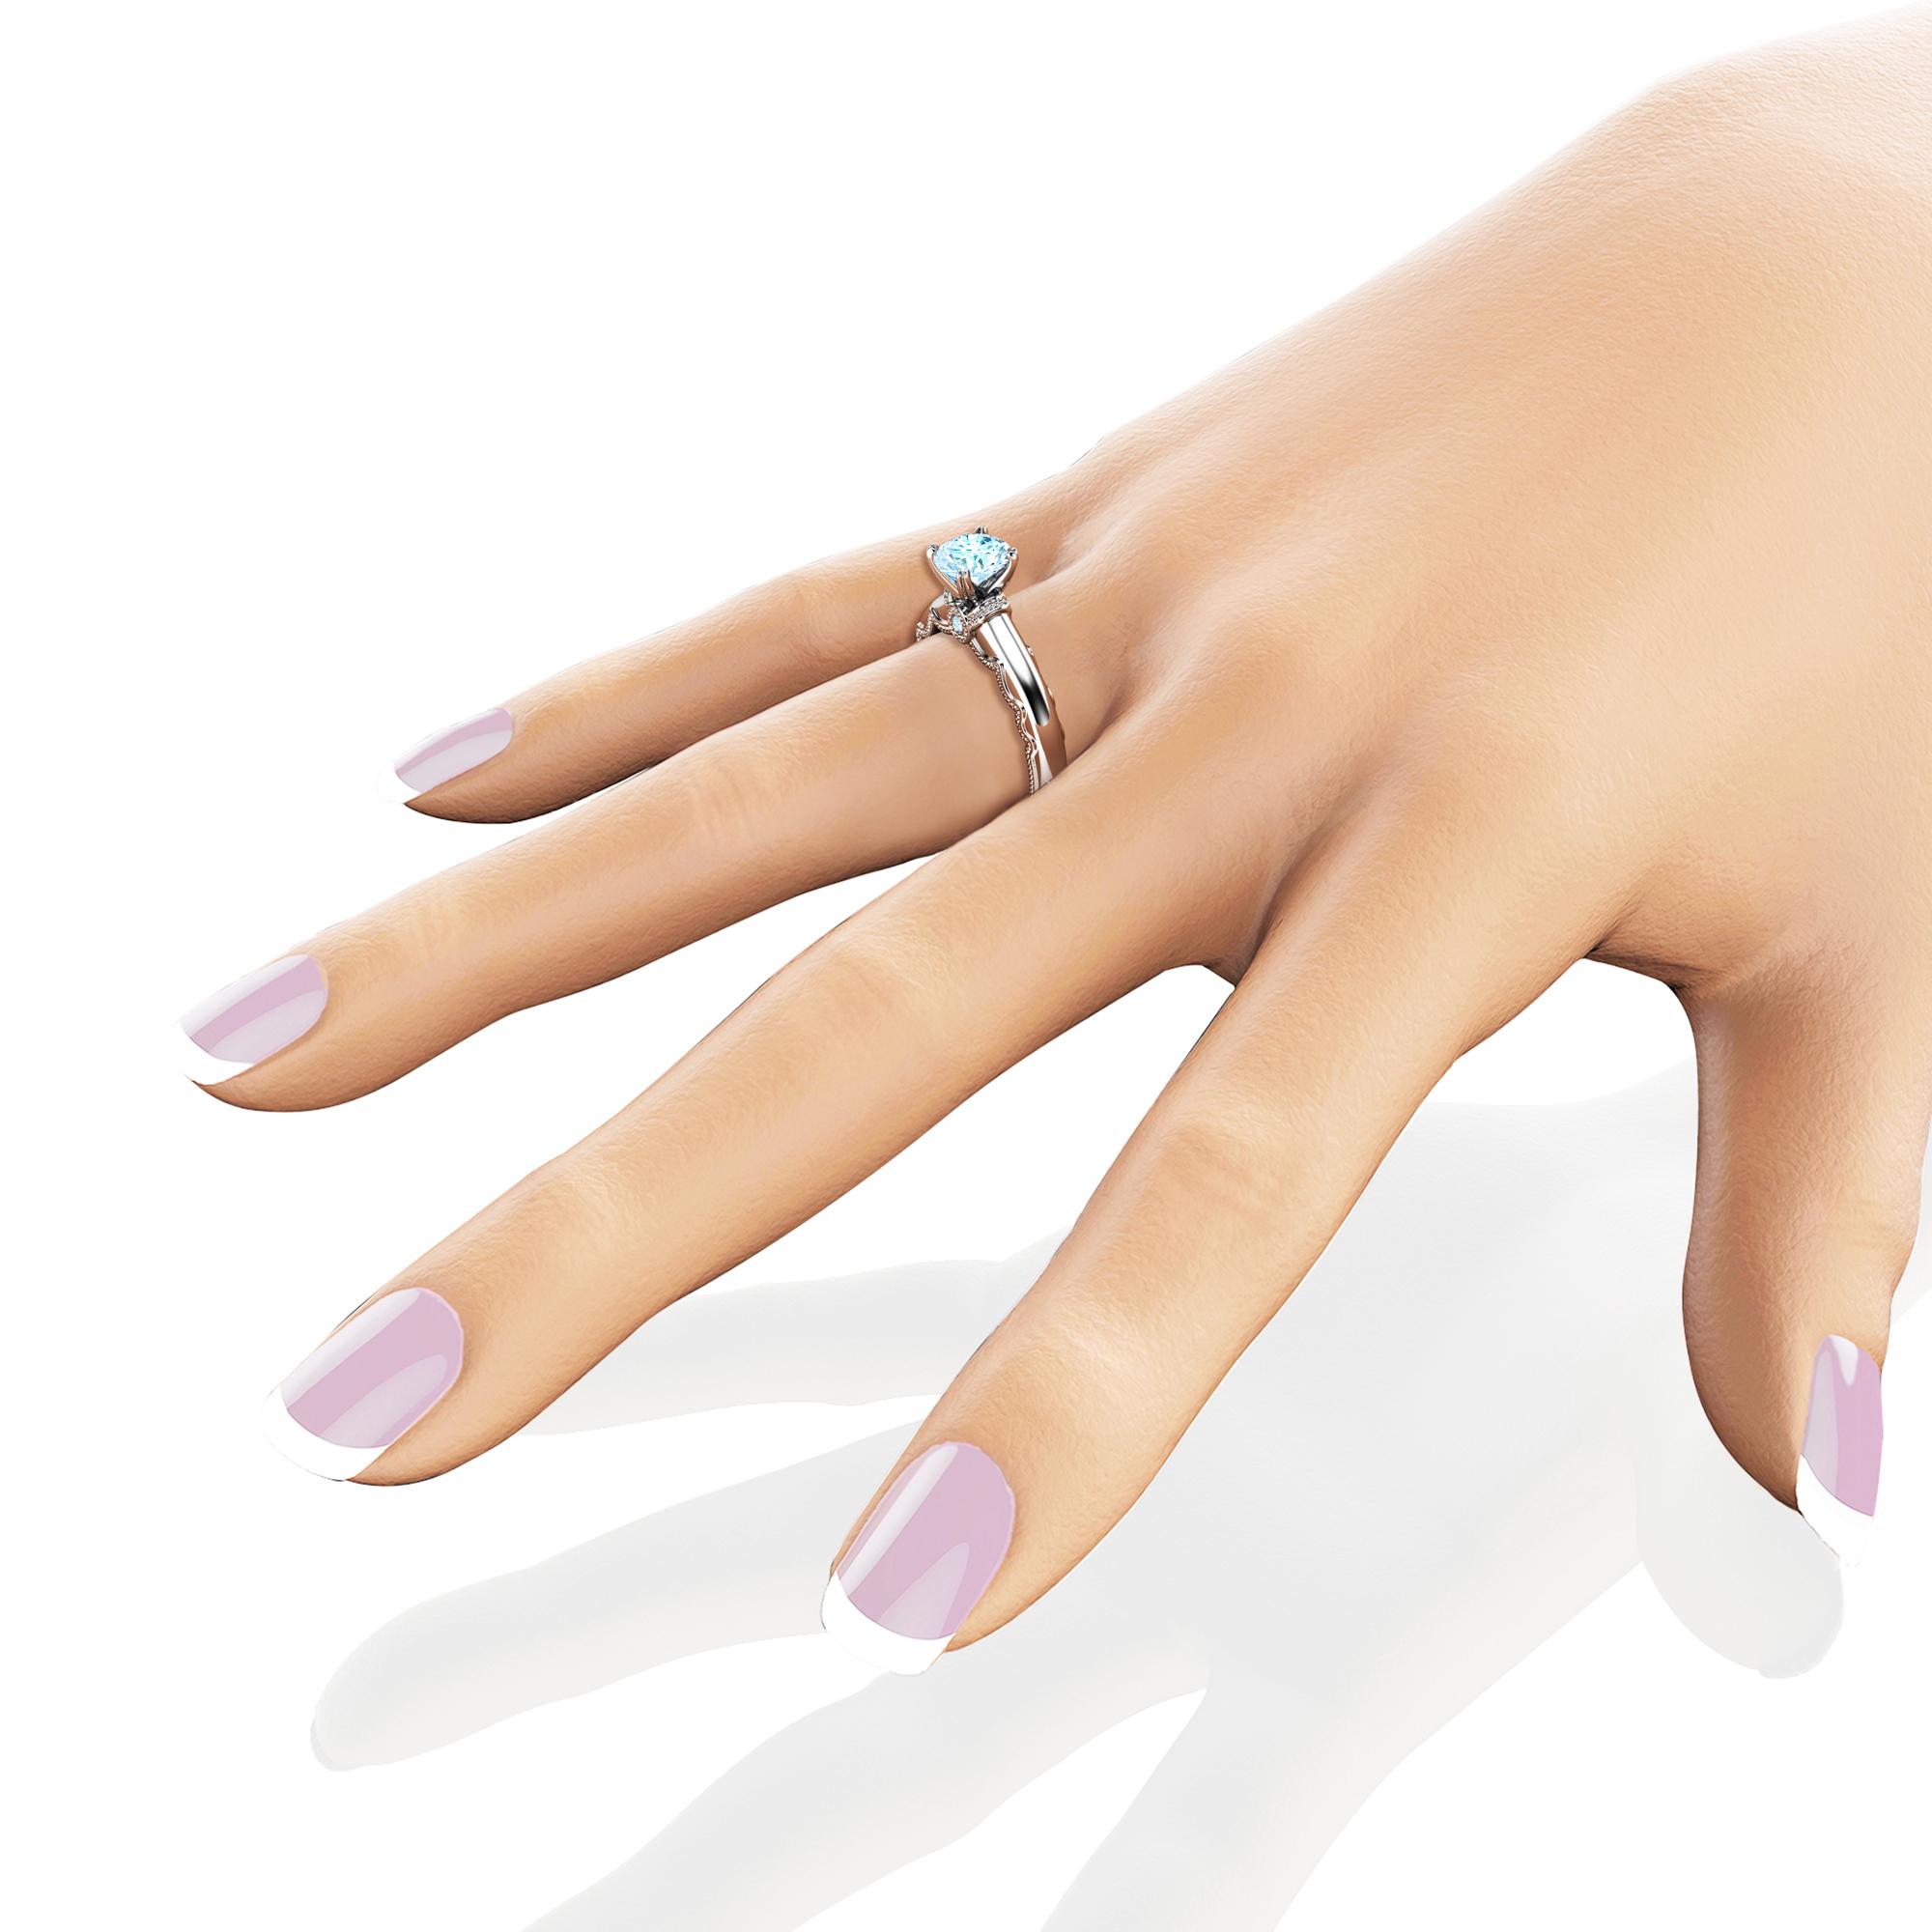 Aquamarine Classic Engagement Ring, March Birthstone Aquamarine Unique Gift, March Gemstone Birthstone Gold Ring